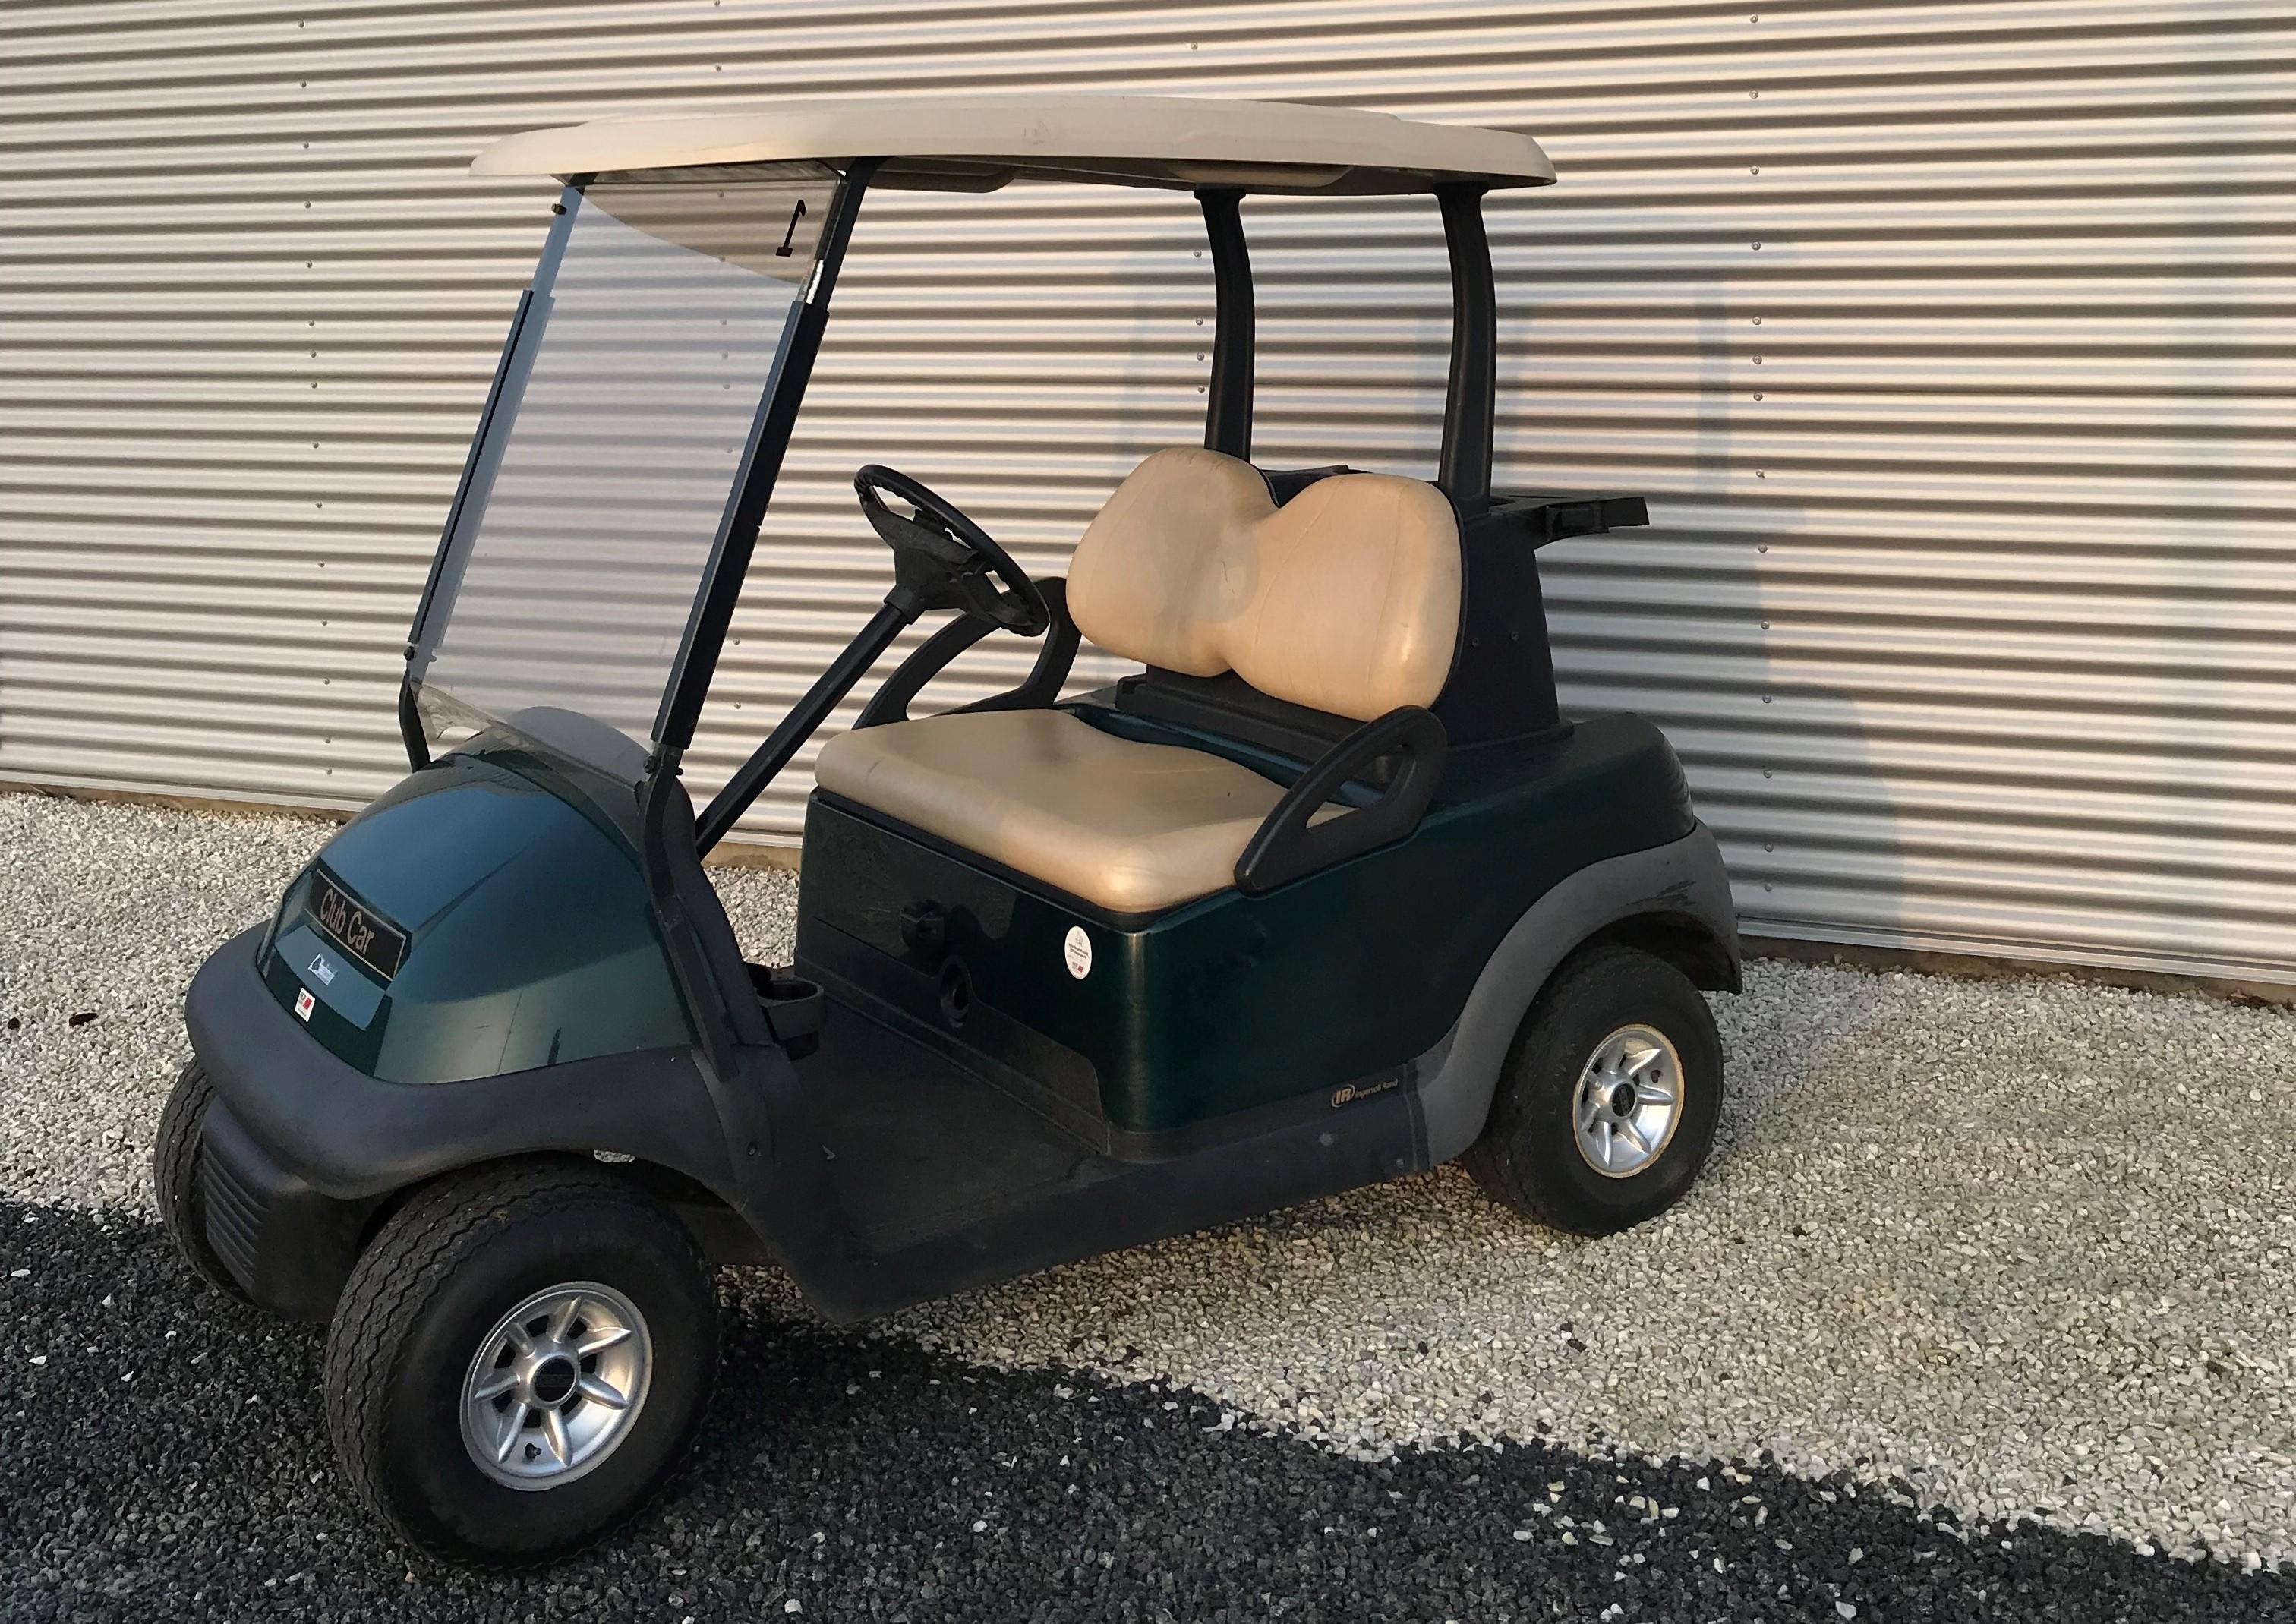 club car precedent muchbetter golf. Black Bedroom Furniture Sets. Home Design Ideas